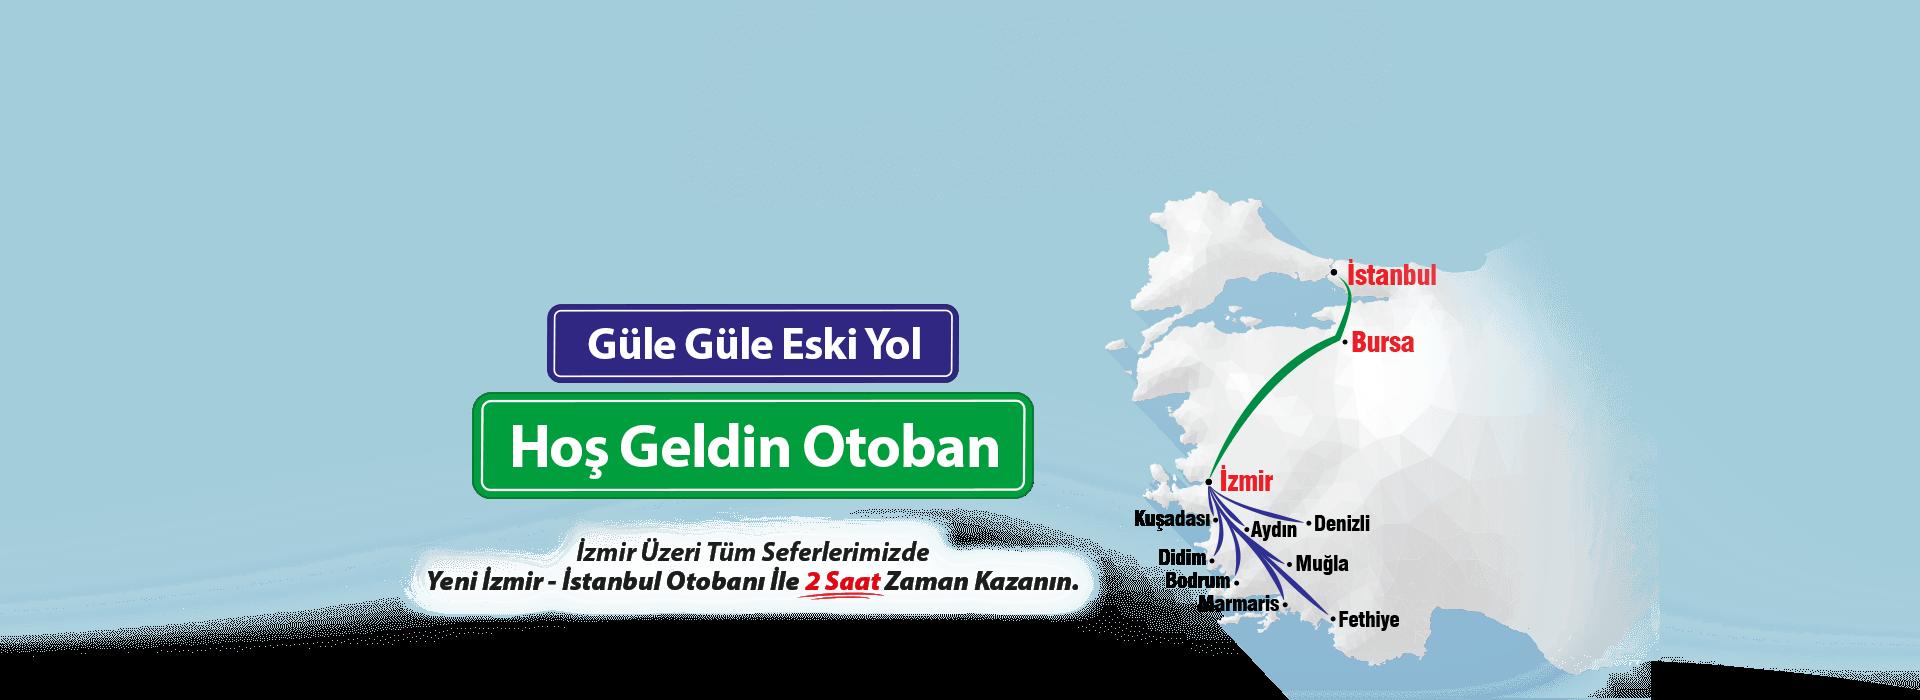 İzmir İstanbul Otoban Genel